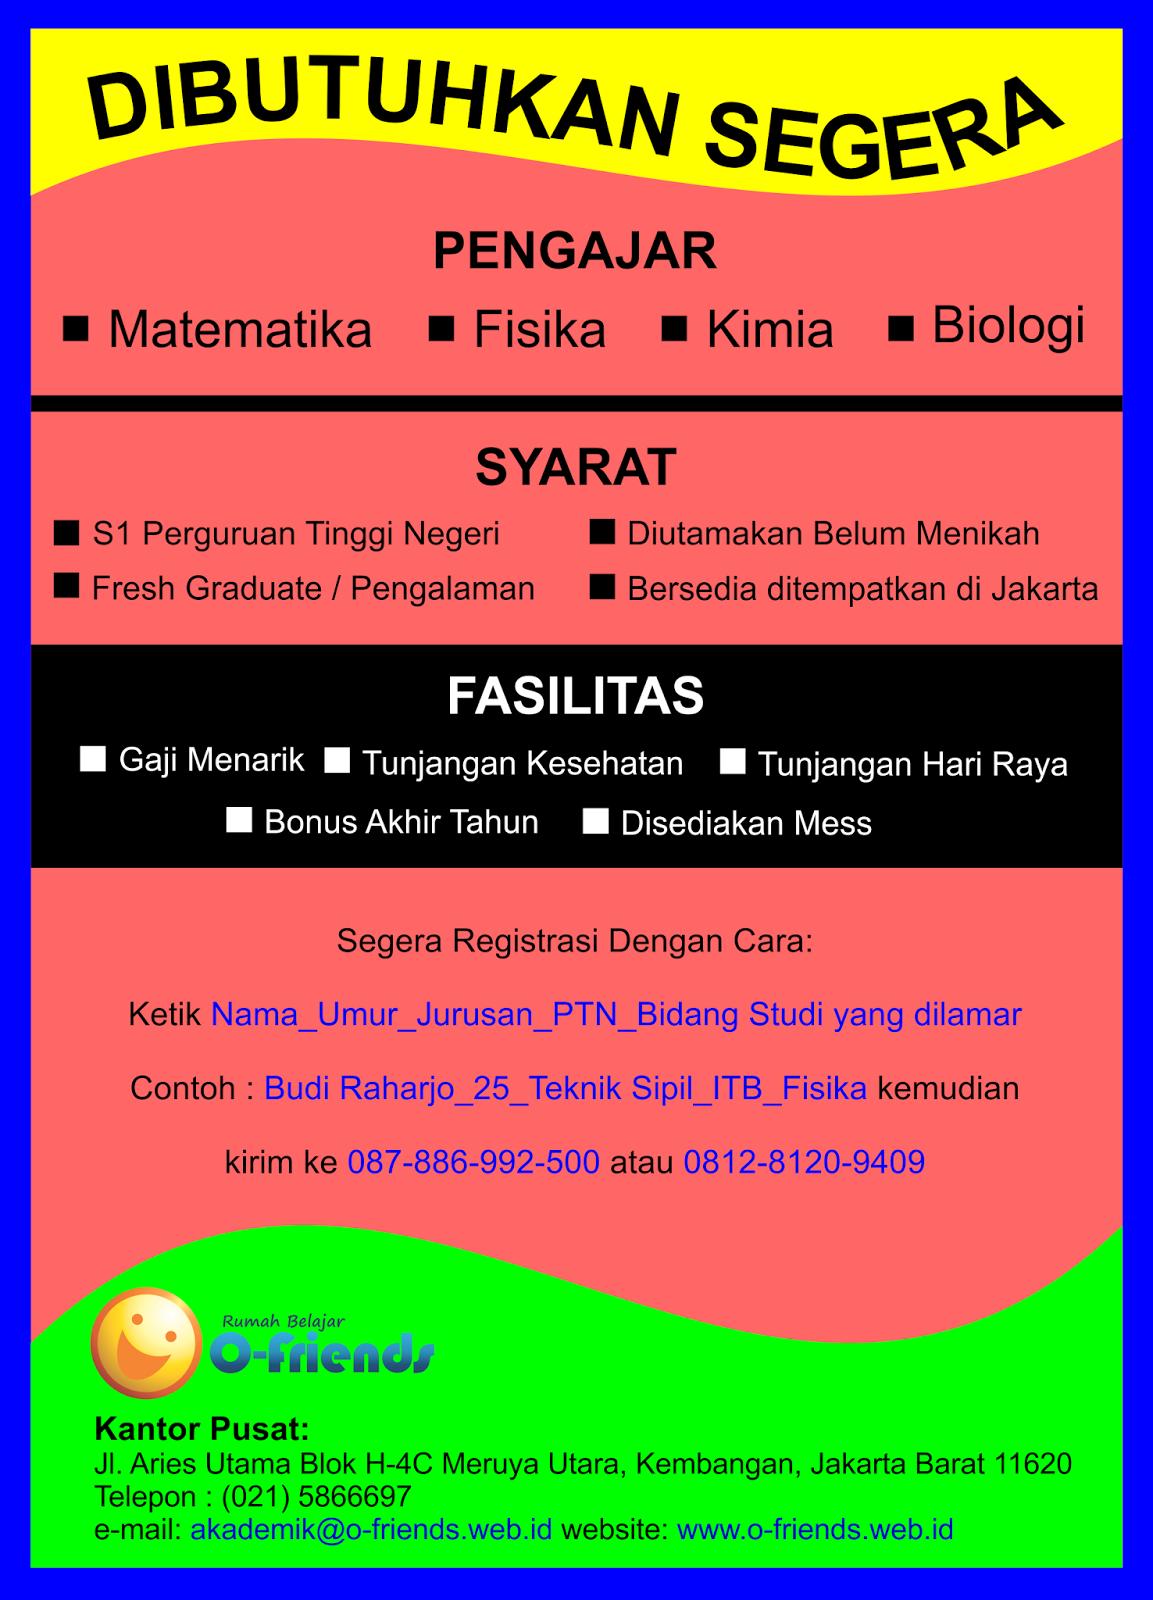 Lowongan Kerja Rumah Belajar O-Friends Januari 2017